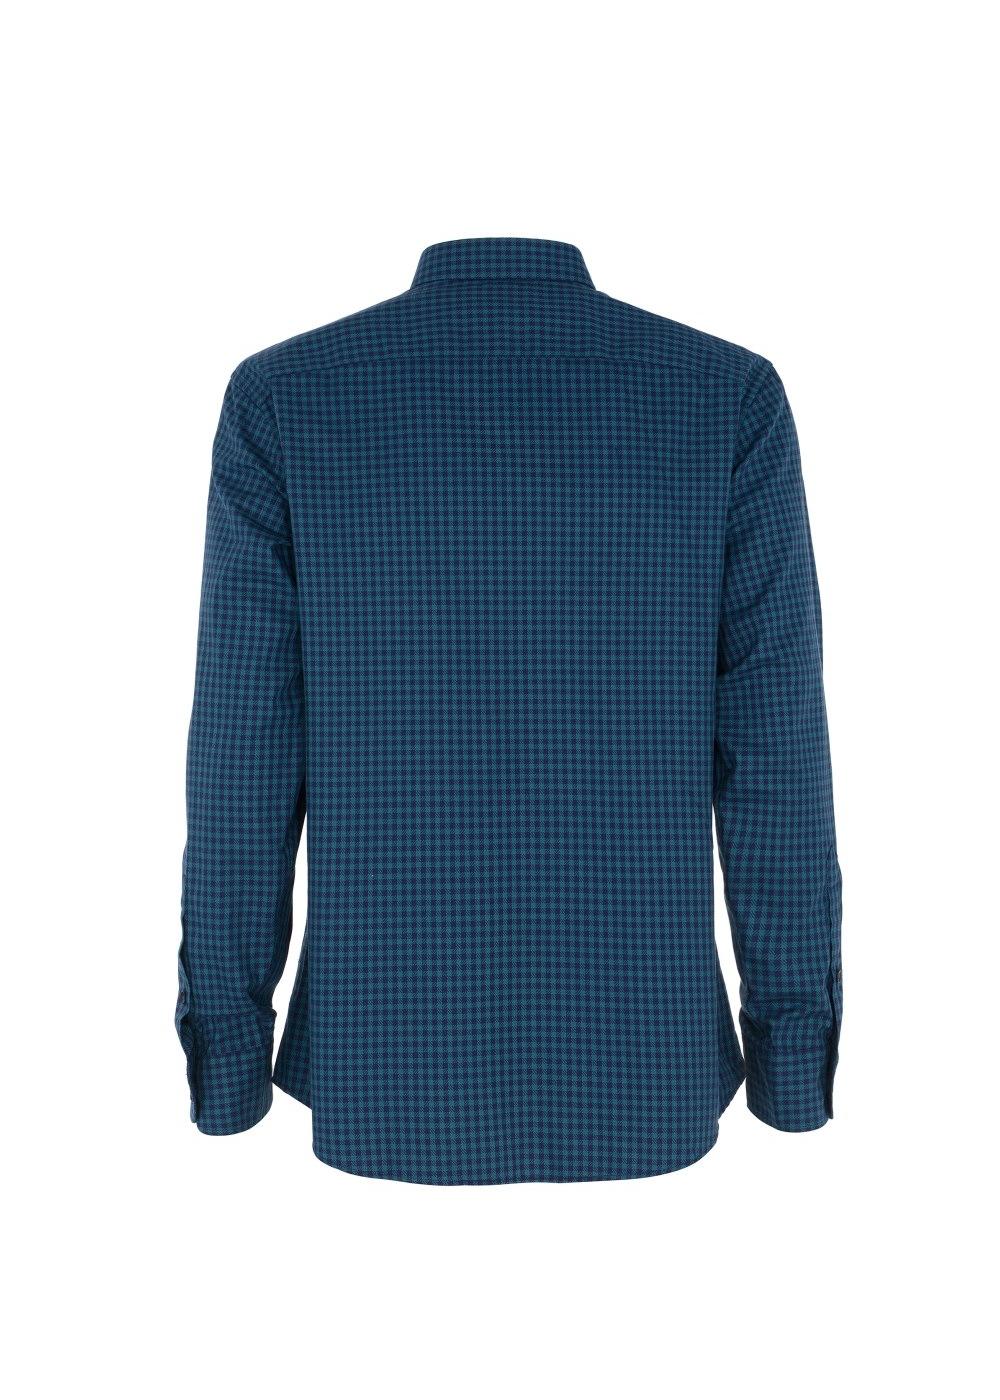 Koszula męska KOSMT-0151-63(Z19)